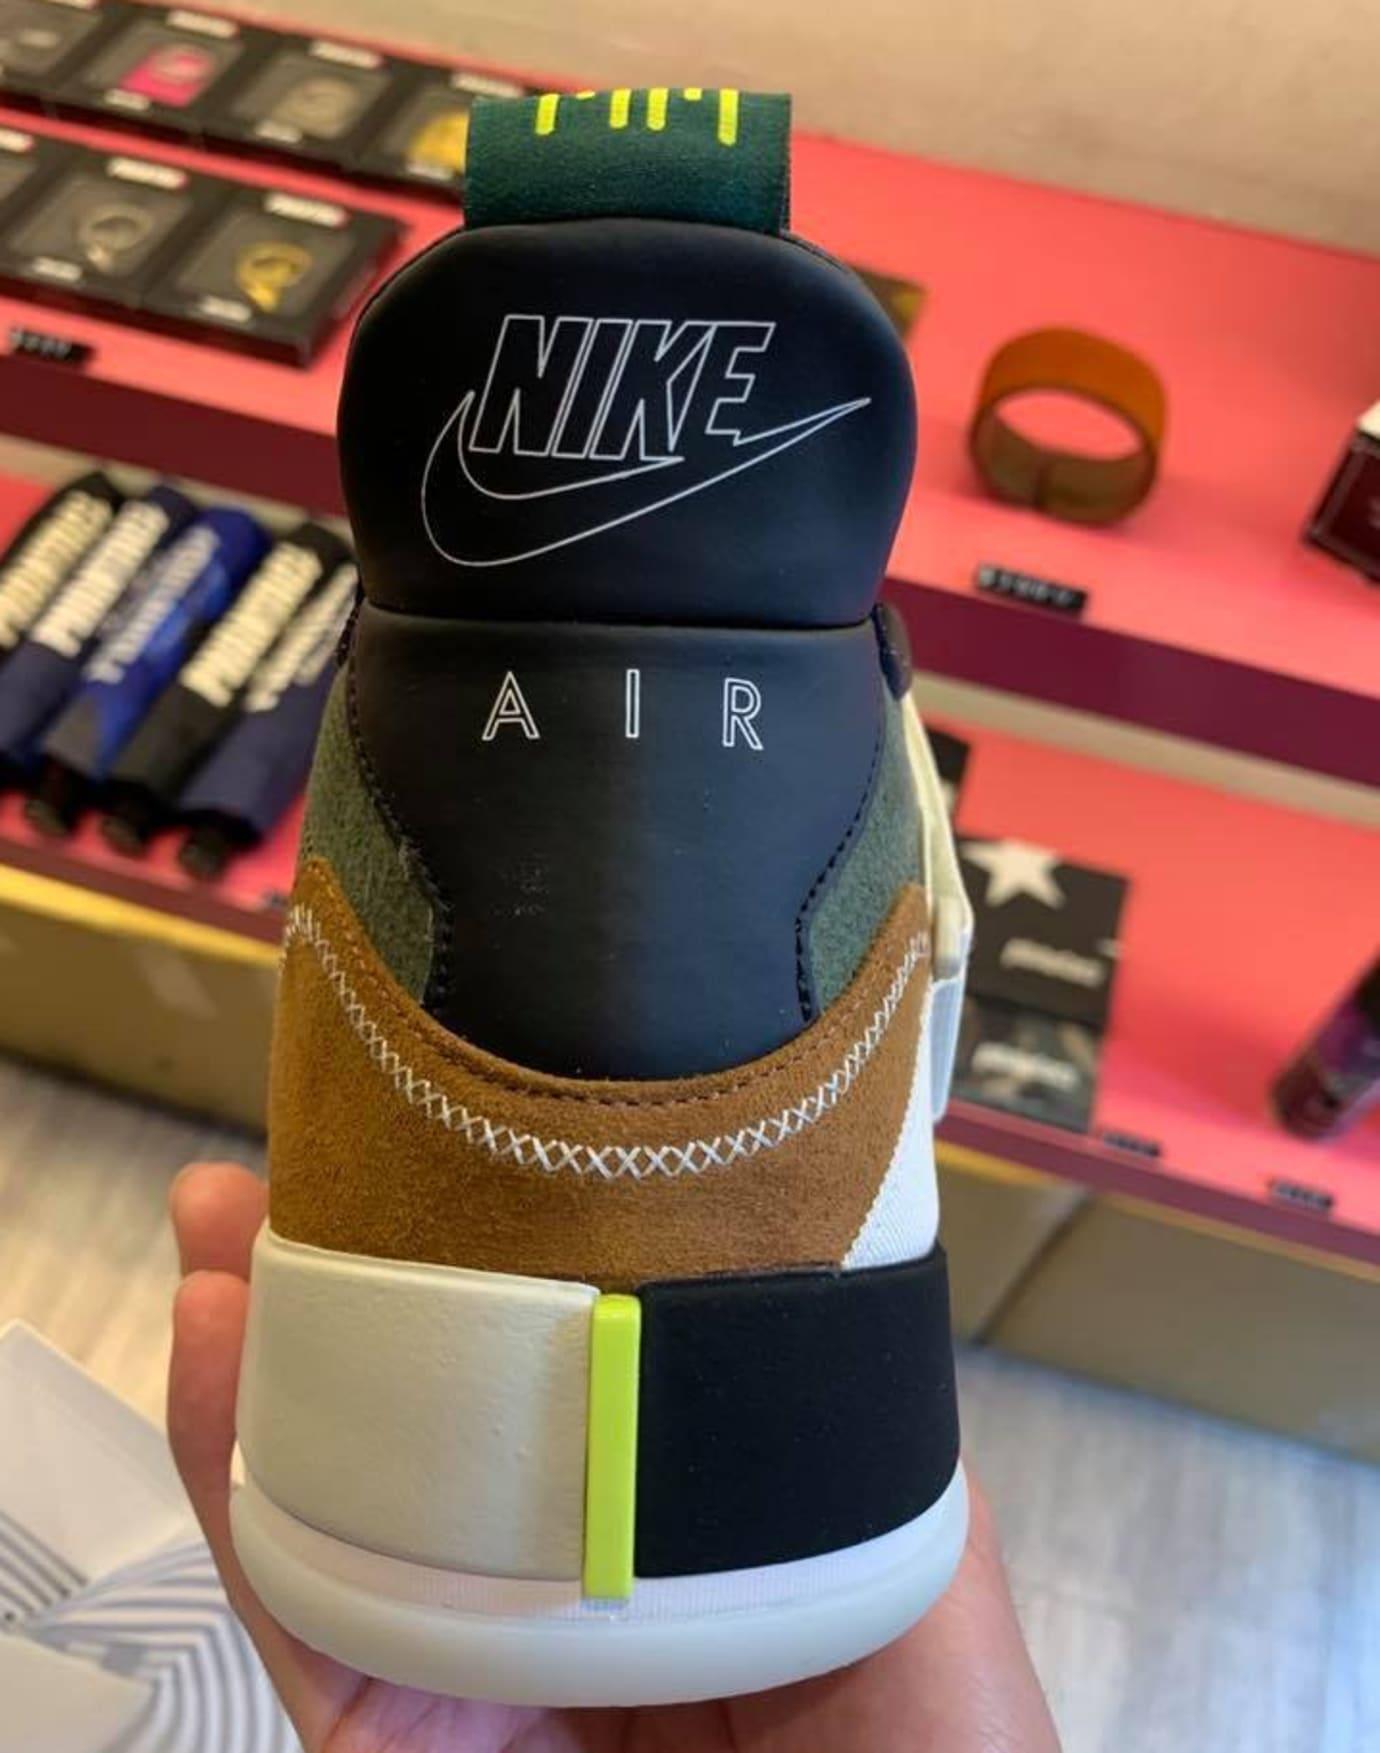 Air Jordan 33 NRG 'Travis Scott' CD6965-300 (Heel)